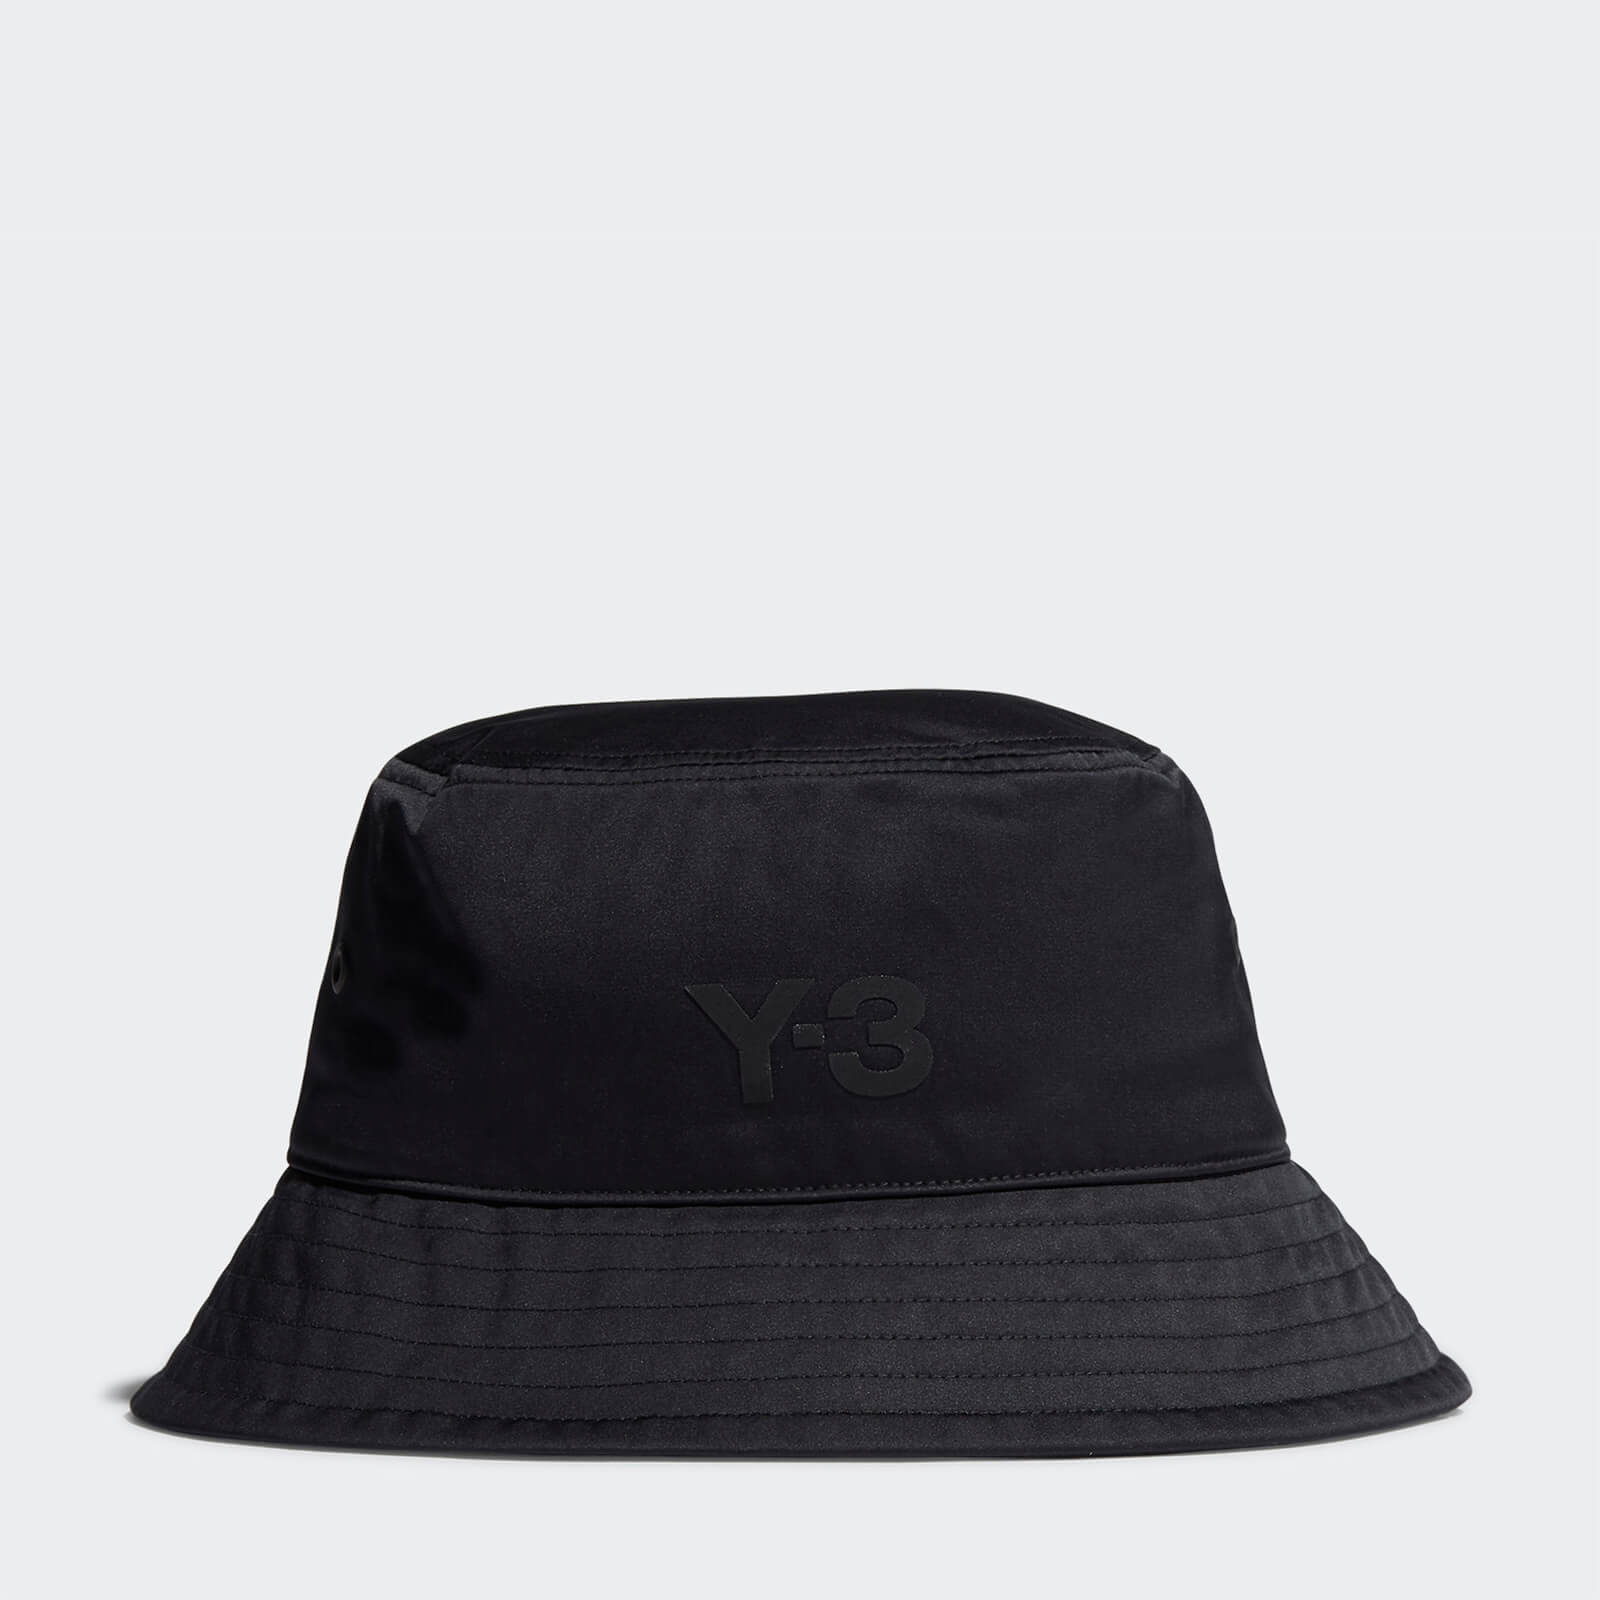 Y-3 Men's Classic Bucket Hat - Black - L/XL